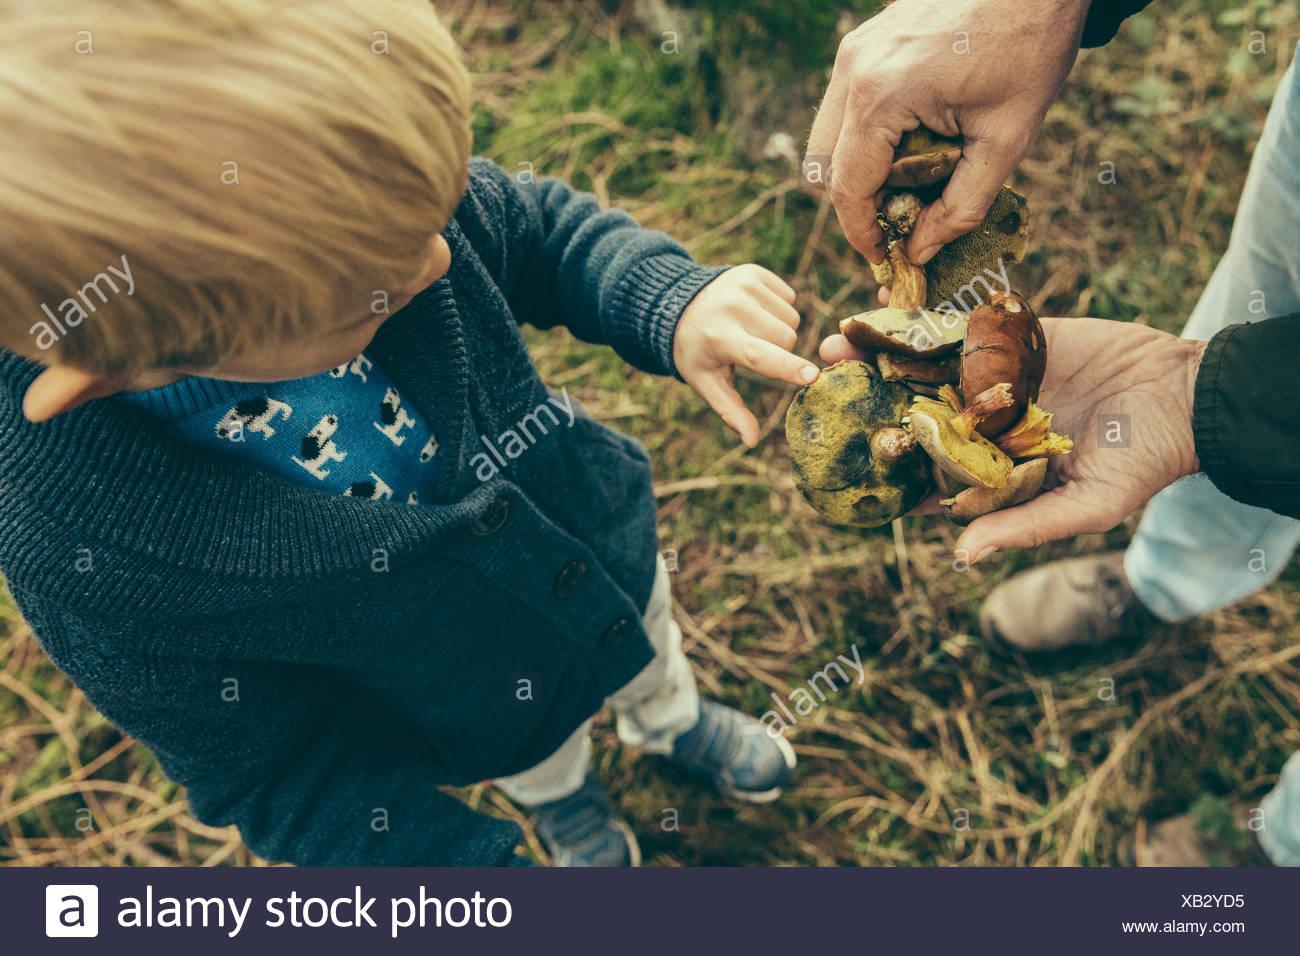 Little boy looking at bay bolete mushrooms in man's hand - Stock Image